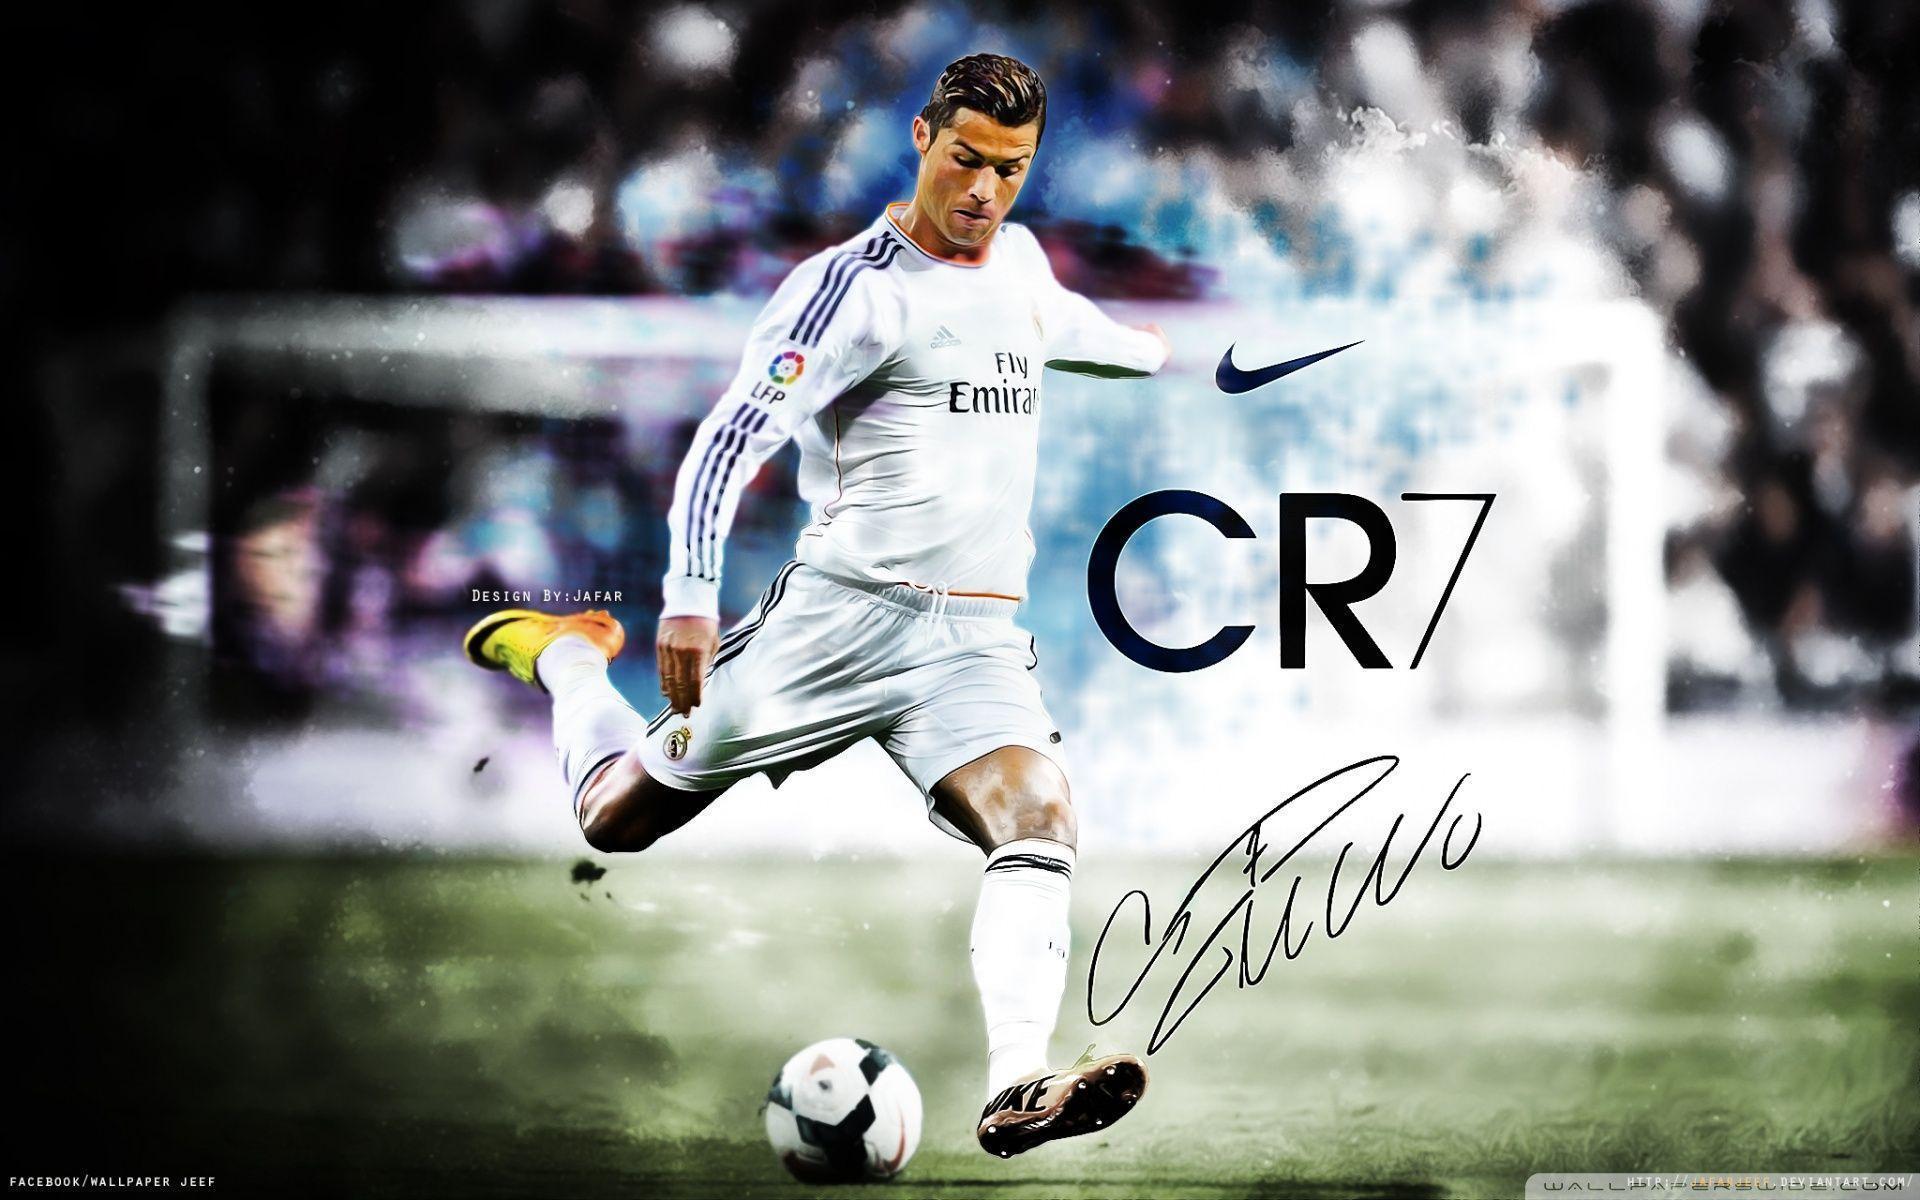 Cristiano Ronaldo Real Madrid Wallpapers Wallpaper Cave